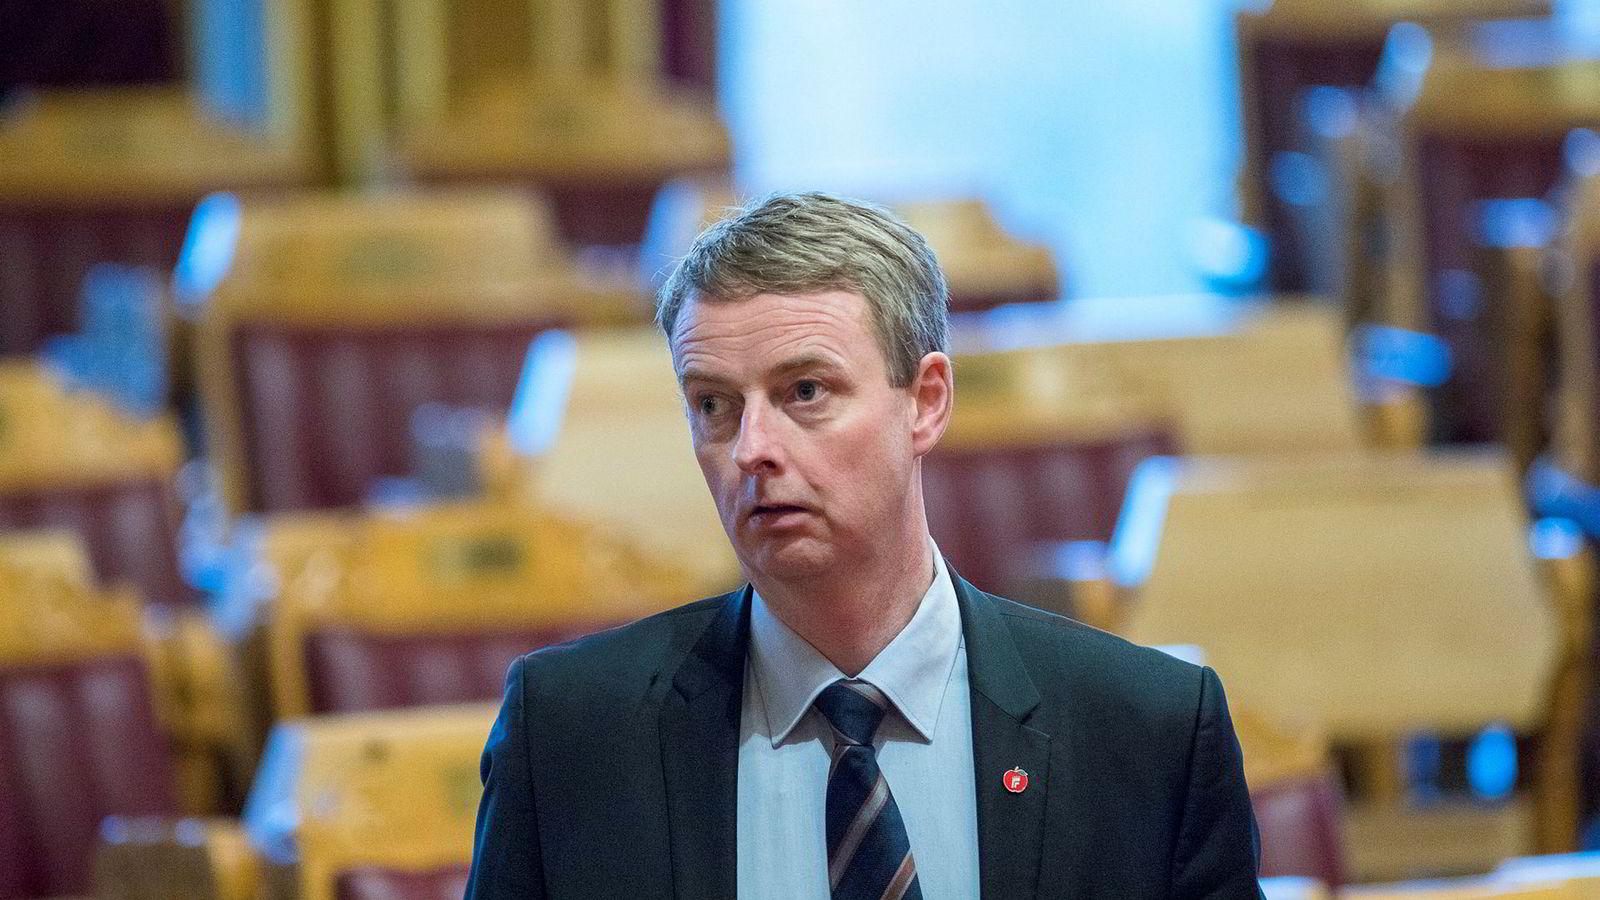 Terje Søviknes, her fra en spørretime på Stortinget mens han var olje- og energiminister.